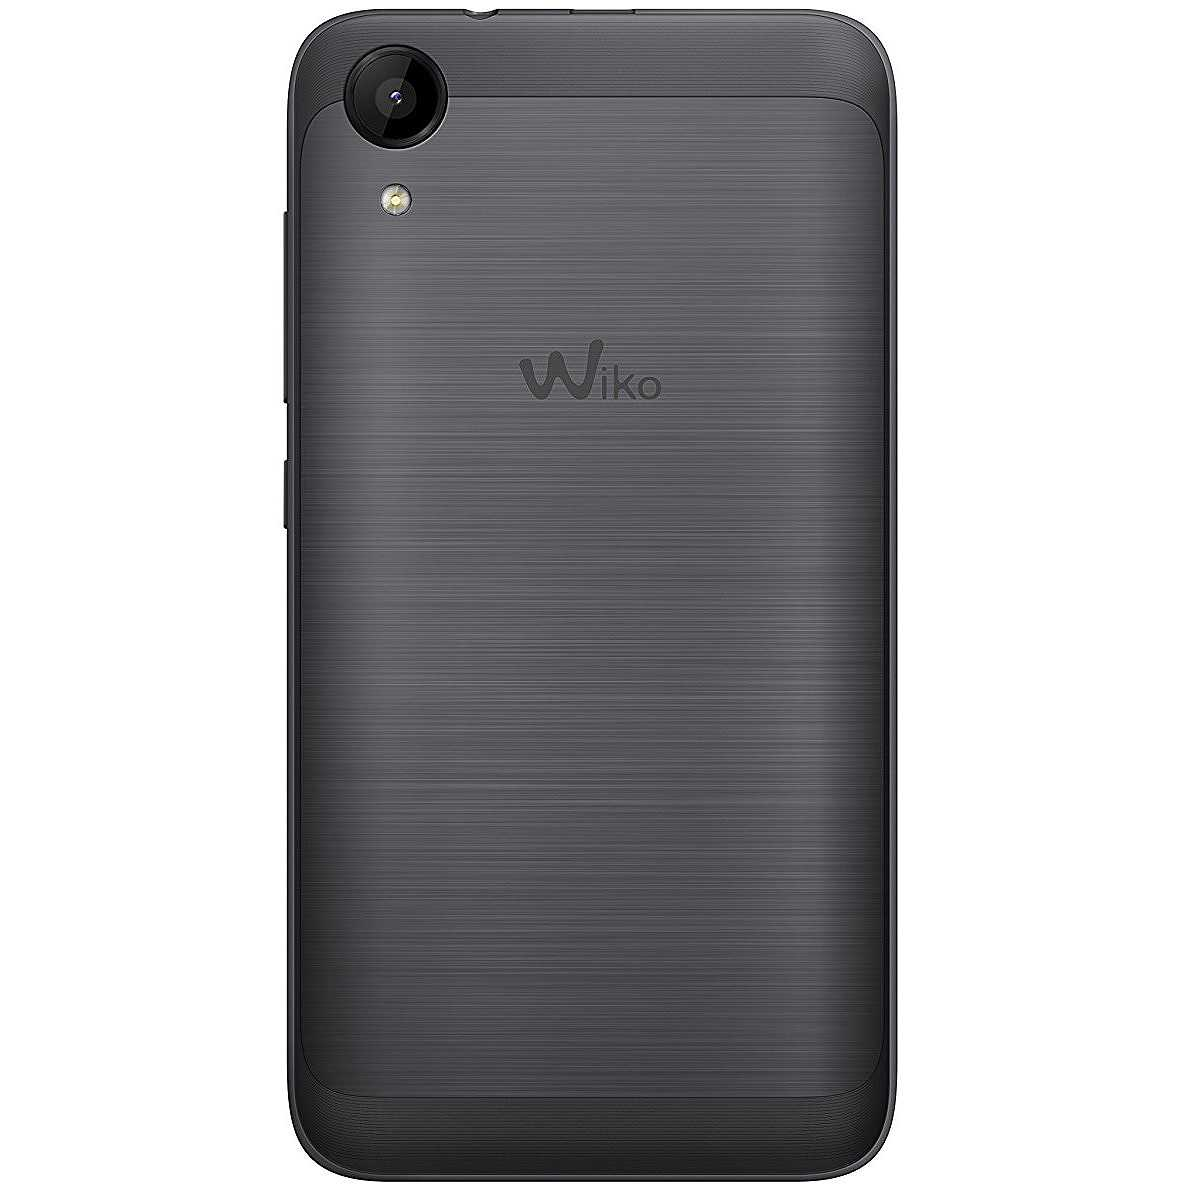 Wiko SUNNY 2 Smartphone Dual Sim Display 4 pollici Ram 512